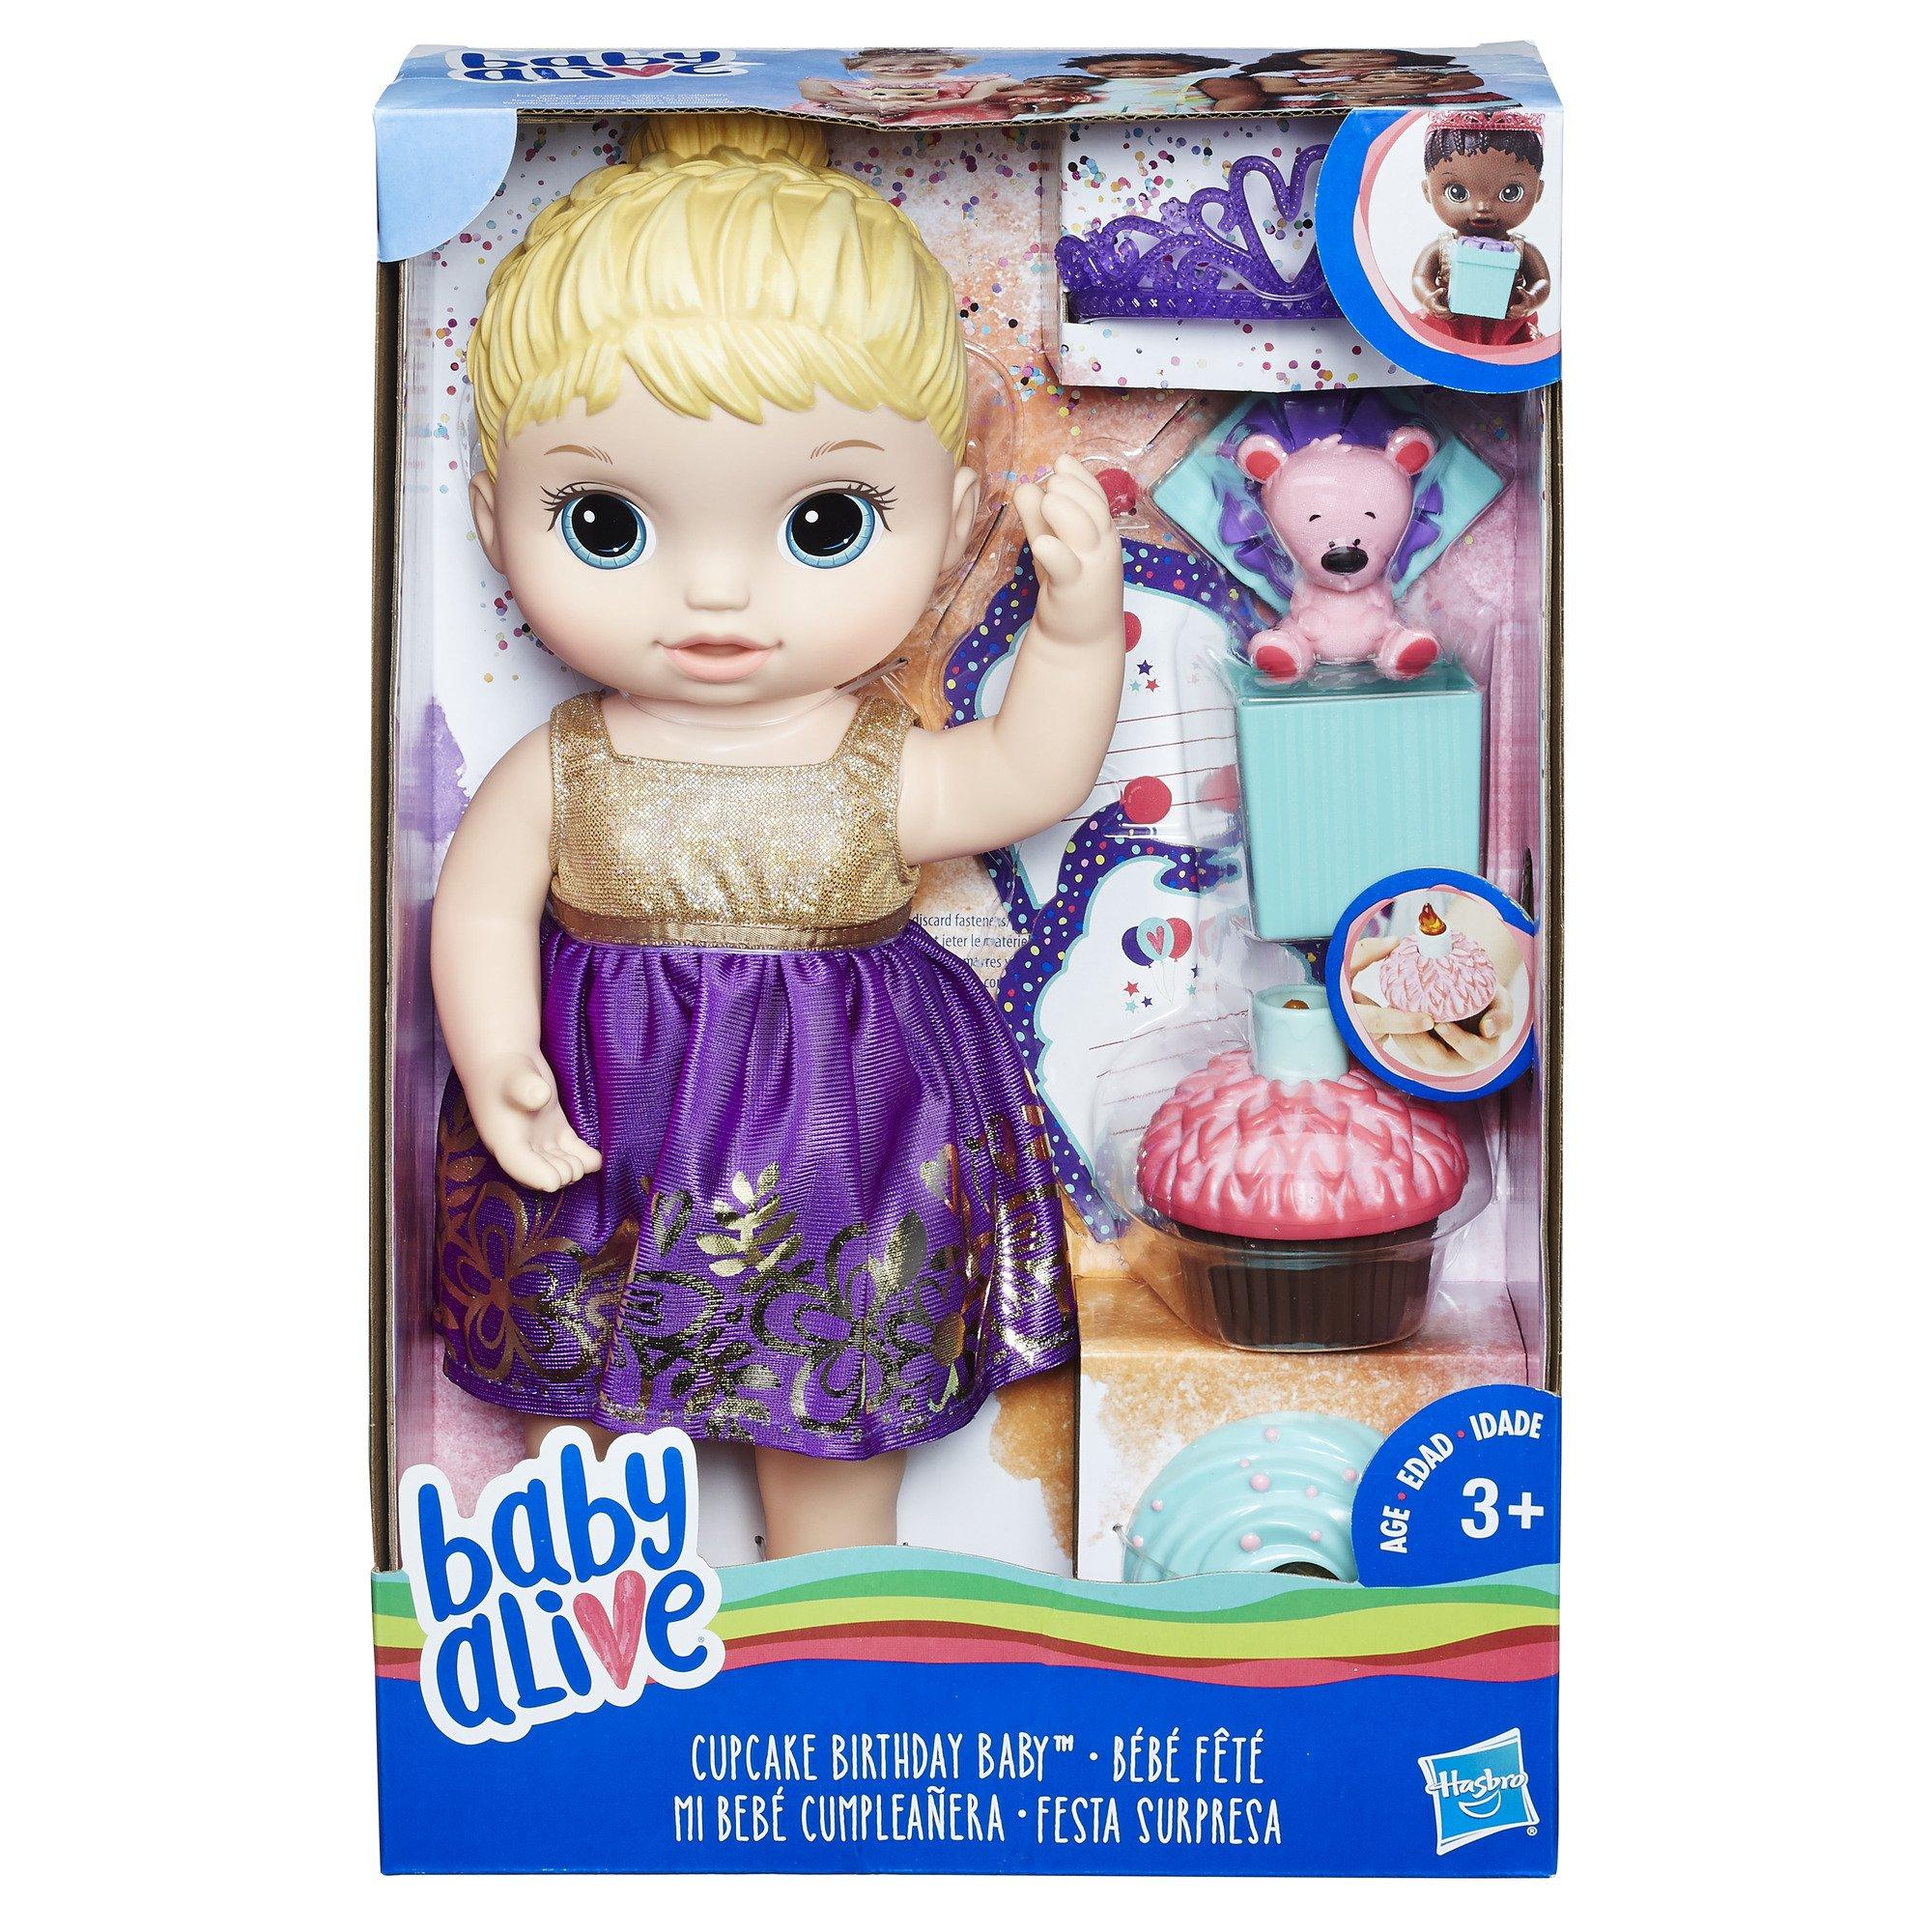 Sears: Baby Alive Muñeca Fiesta Sorpresa Hasbro